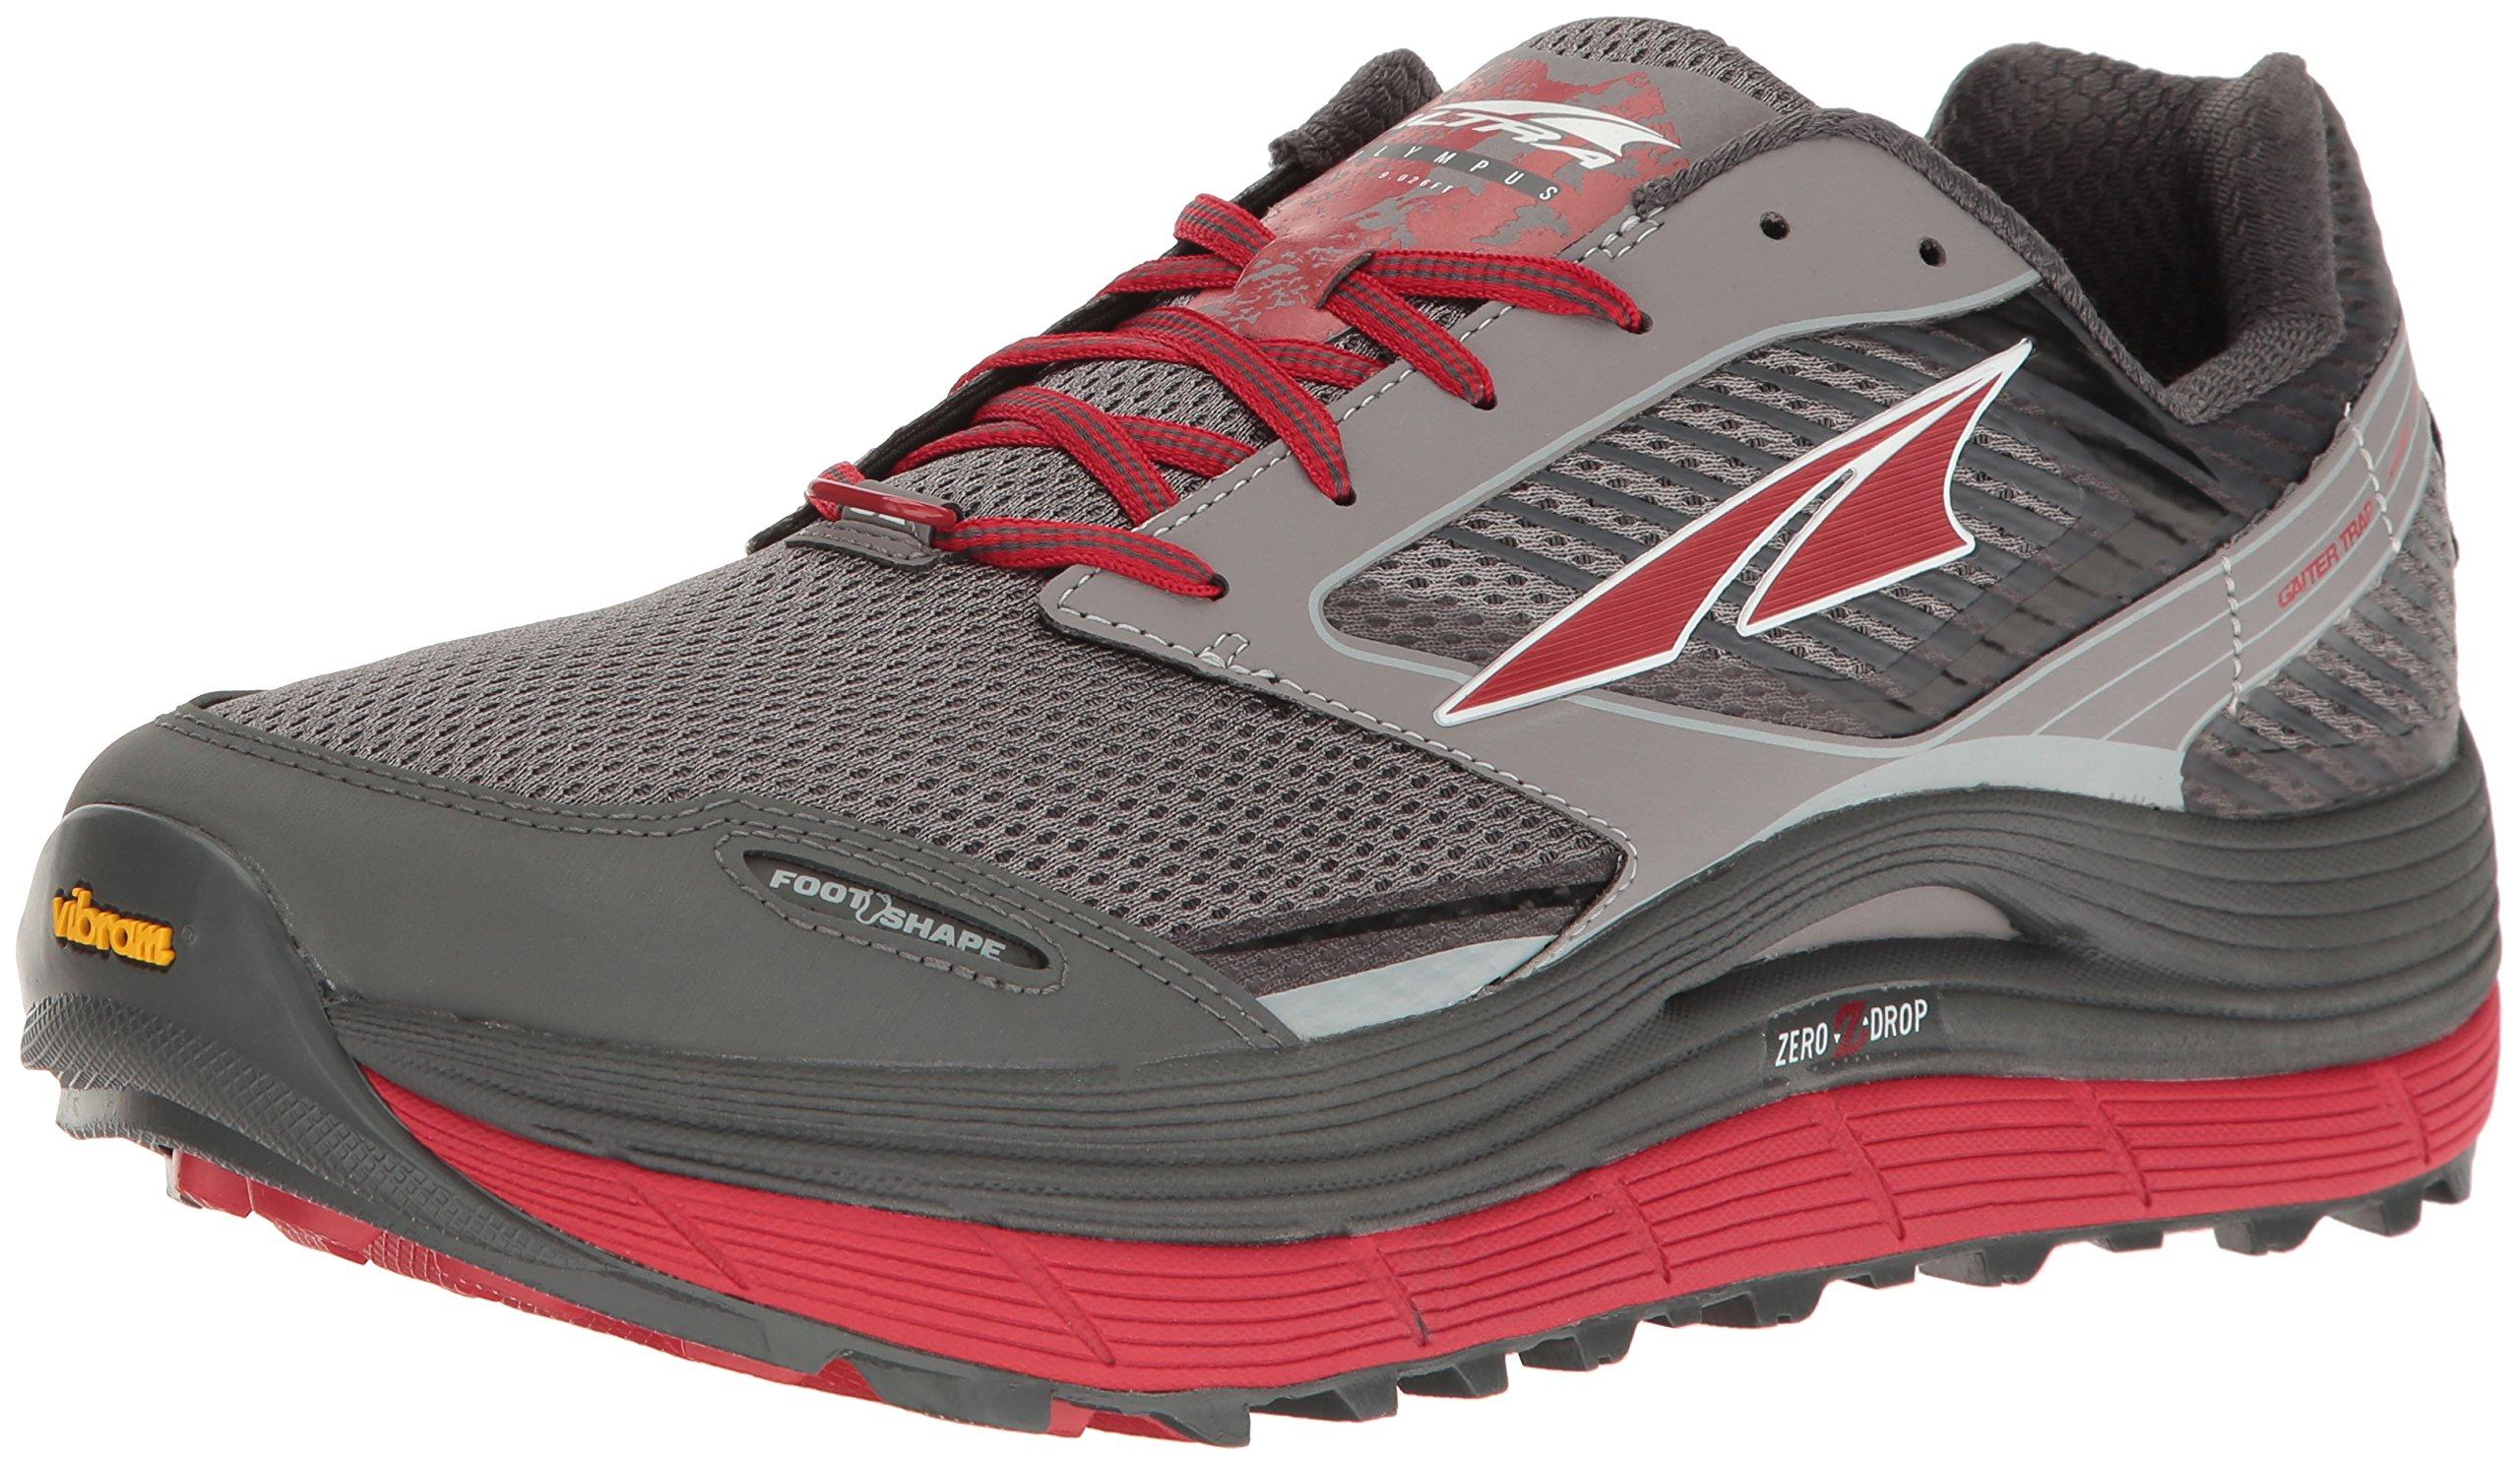 Altra Men's Olympus 2.5 Running-Shoe, Black/Red, 10.5 D US